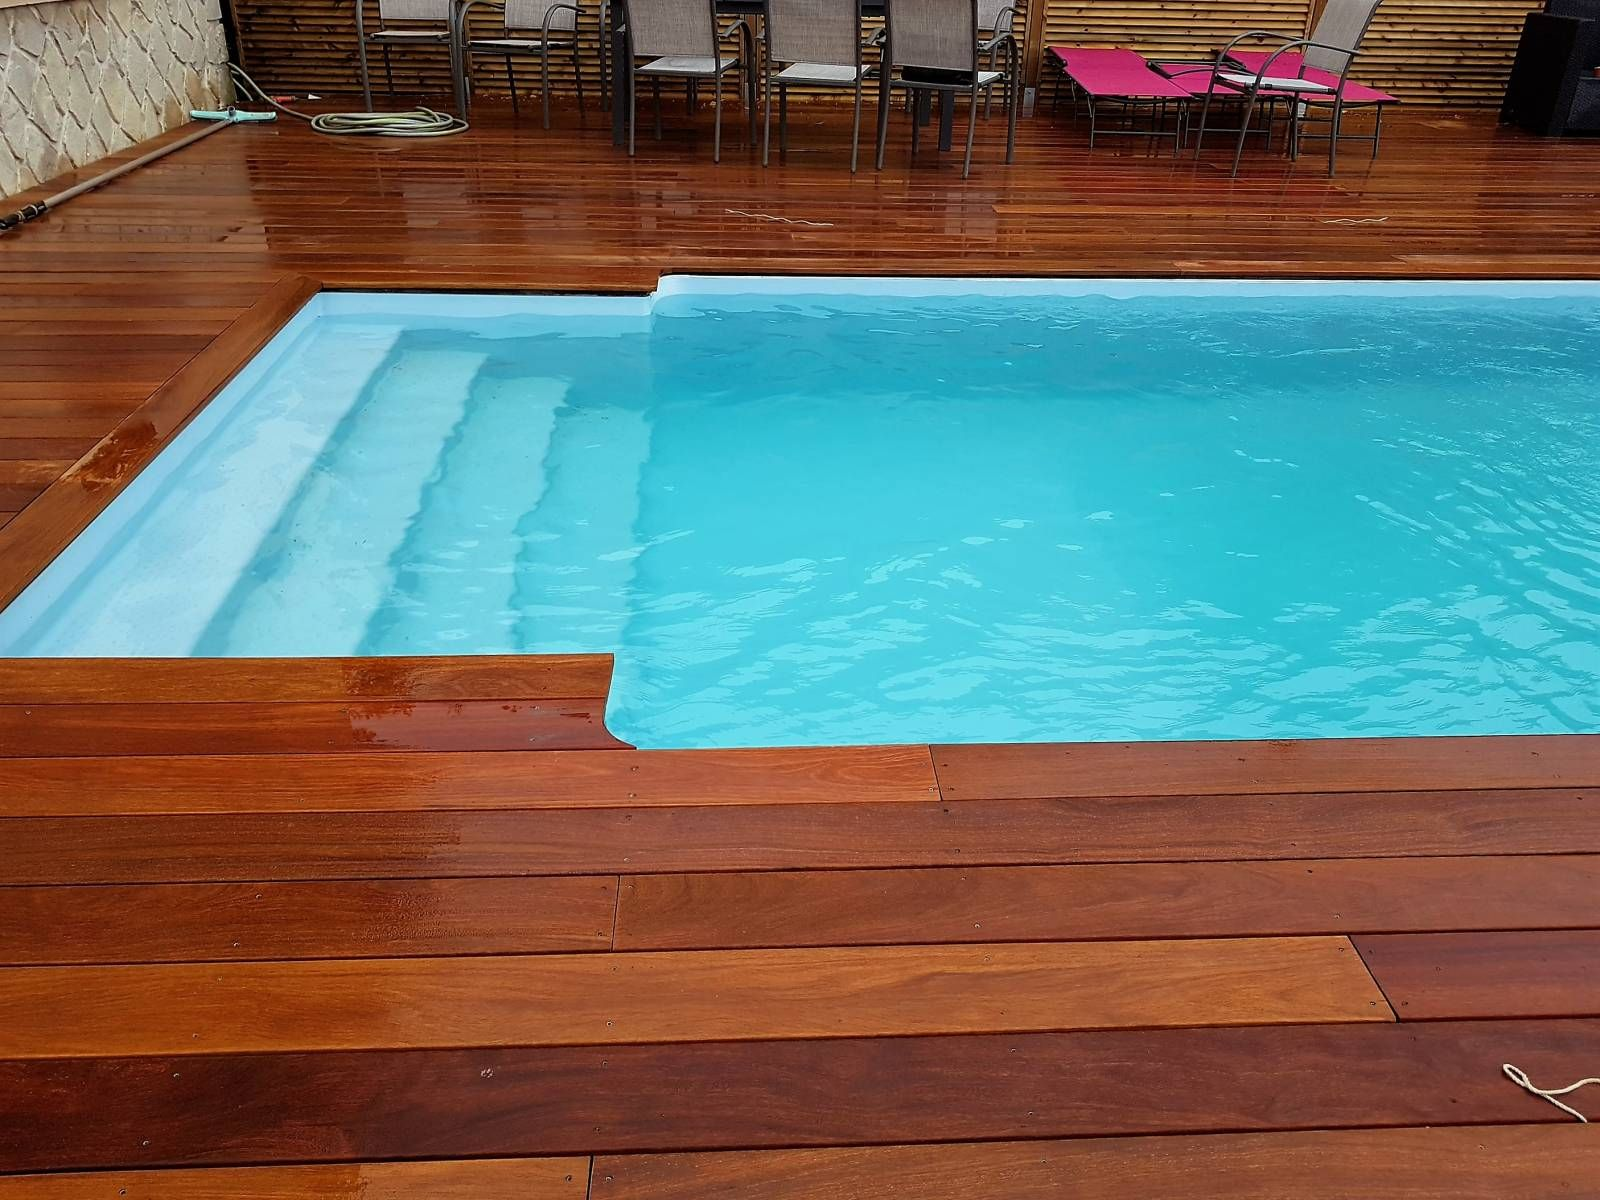 Epingle Sur Trendy Pool Ideas